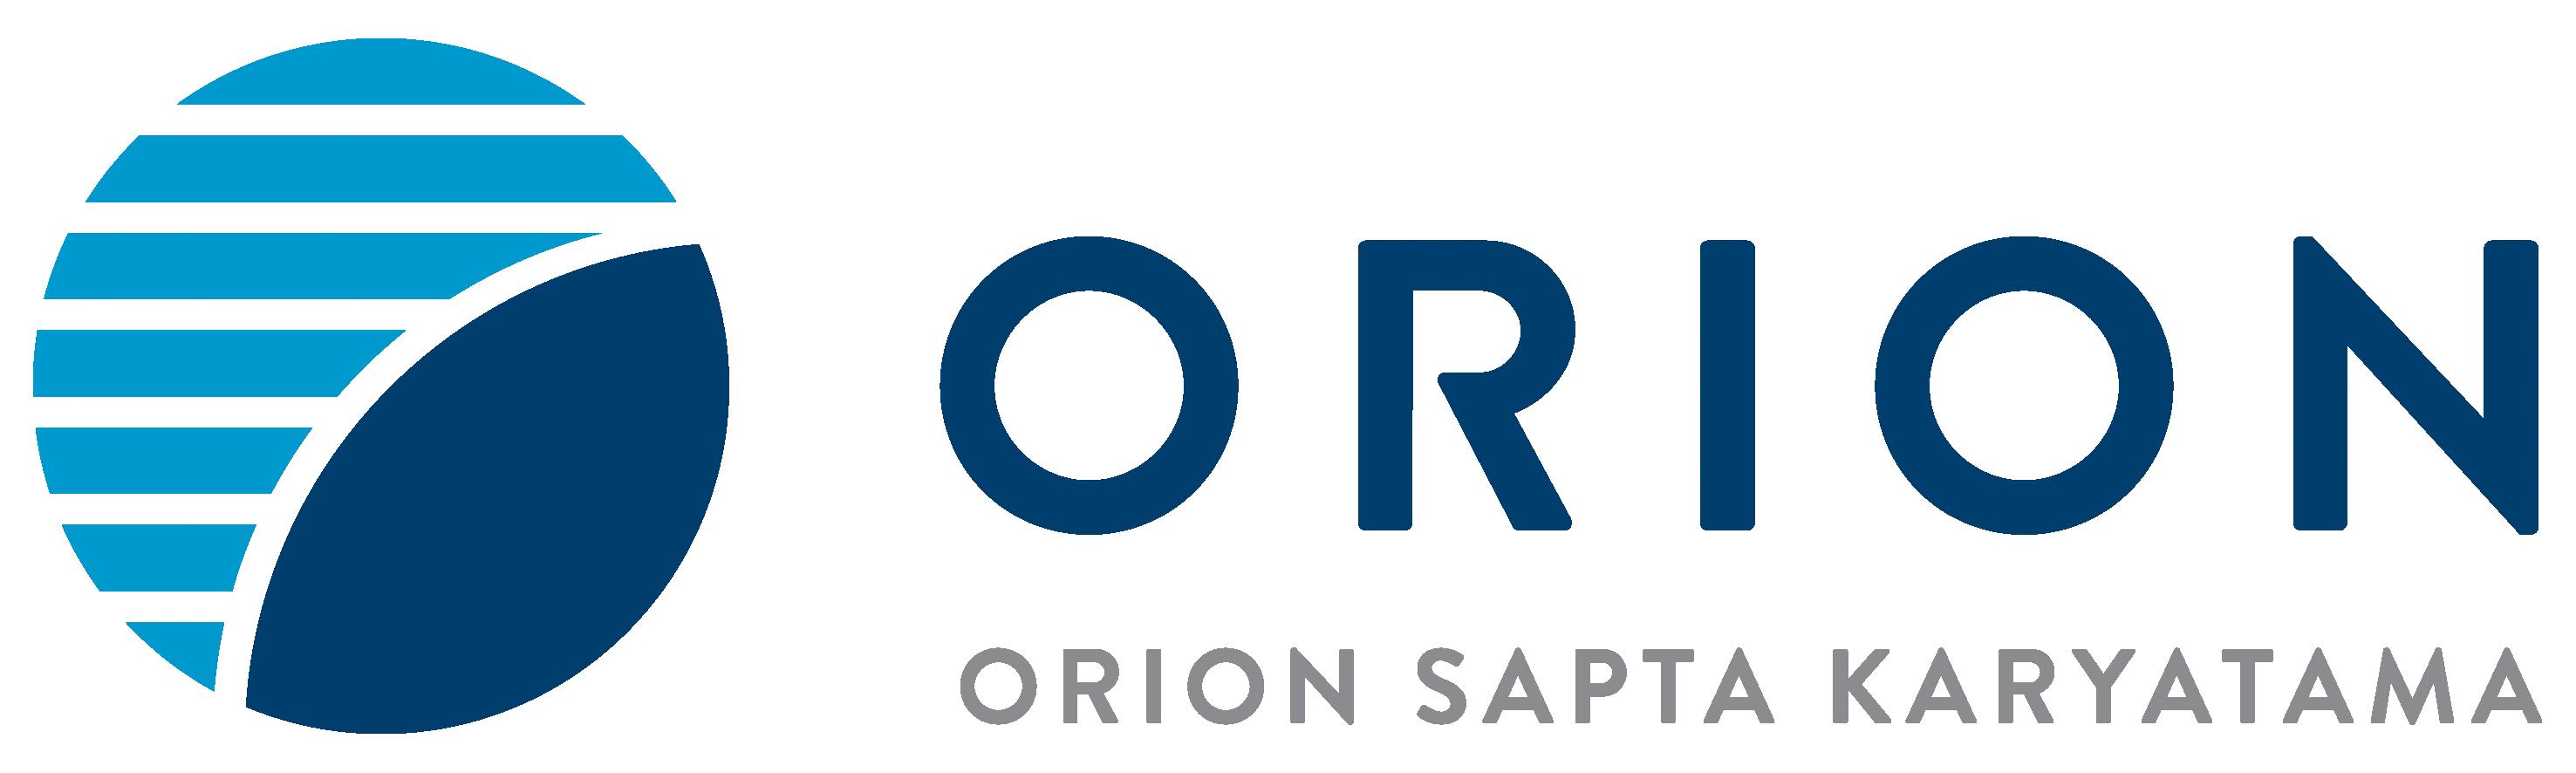 Orion_Logo_RGB - Michelangelo Iwan.png